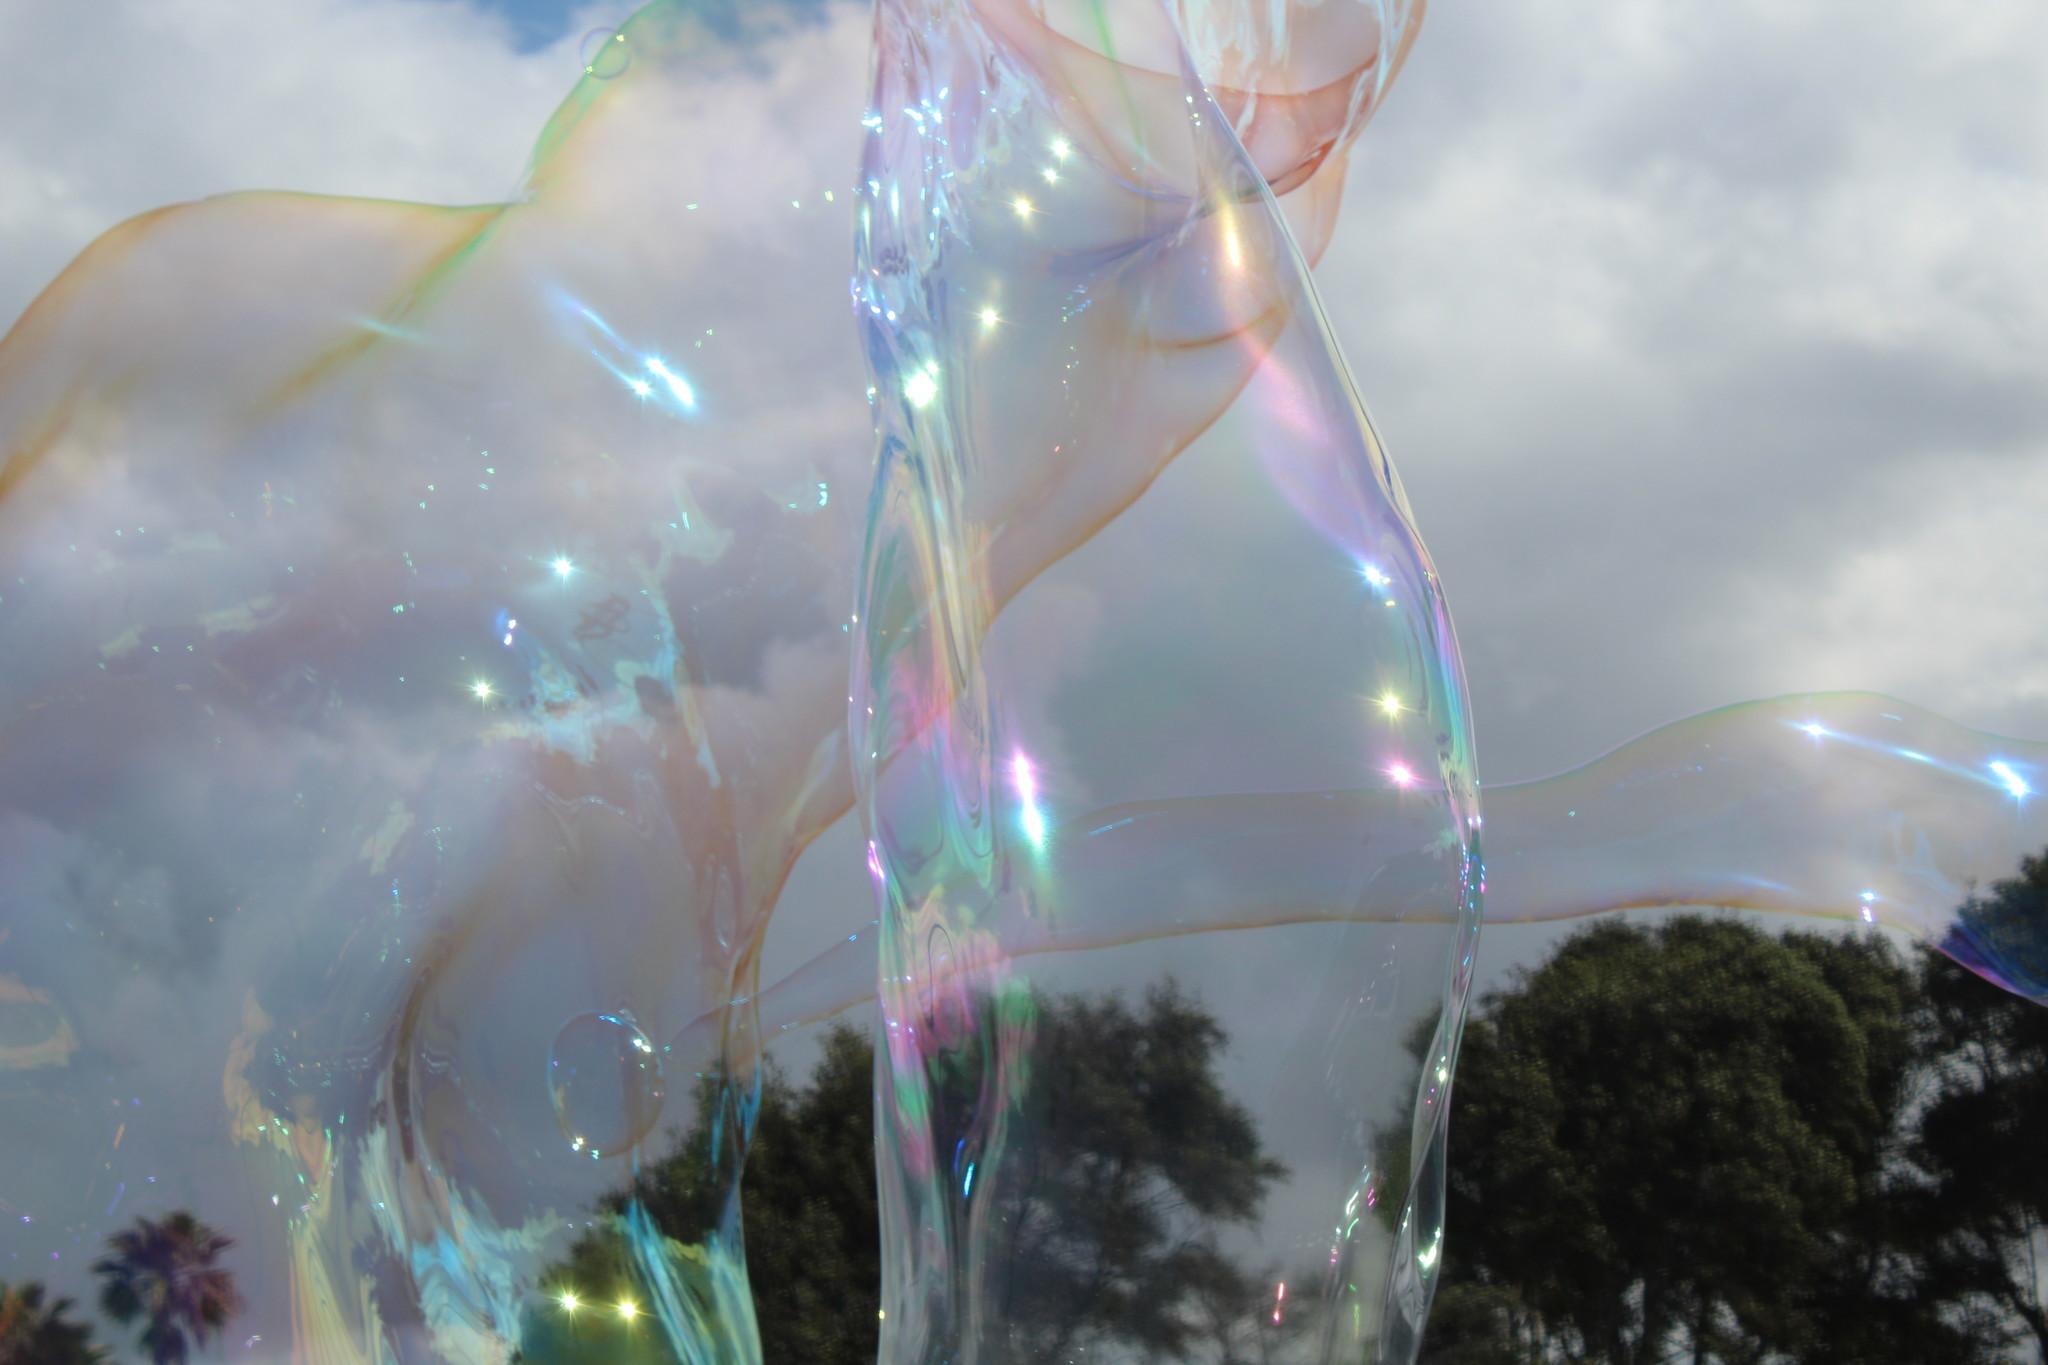 Eric Elam's bubbles rise above Ellen Browning Scripps Park.